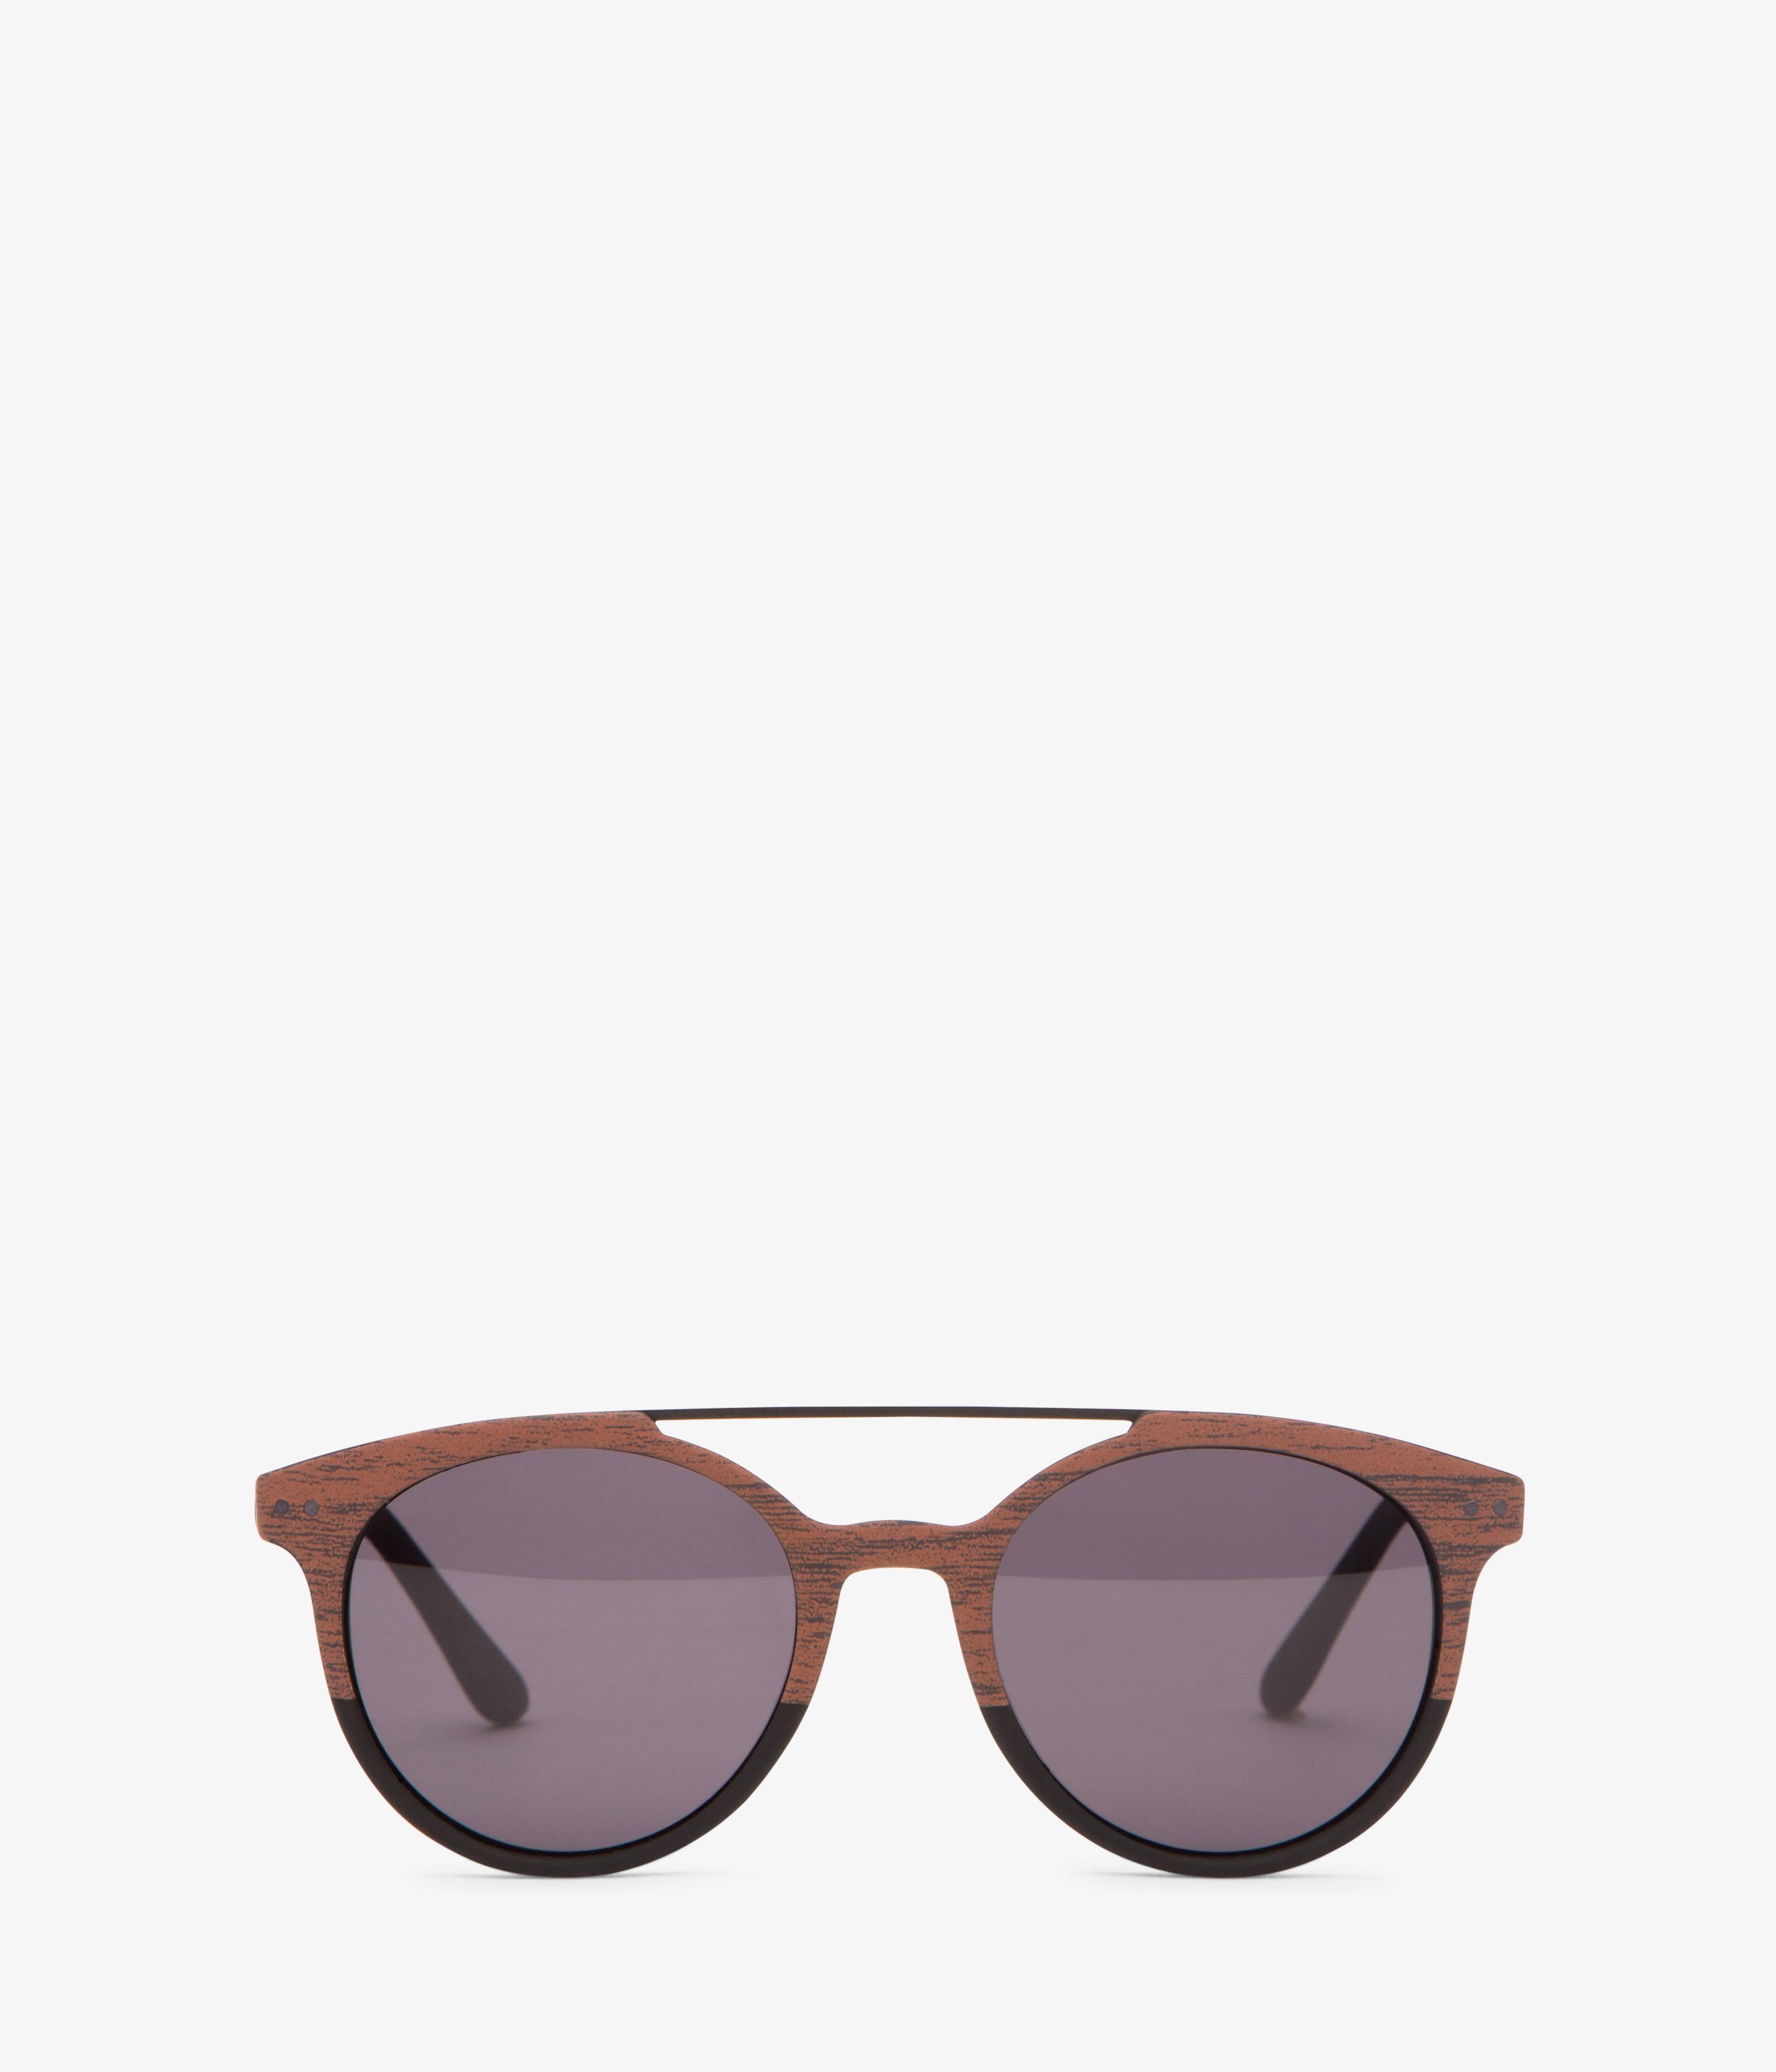 FW18-Sunglasses-Moss-Brown-1